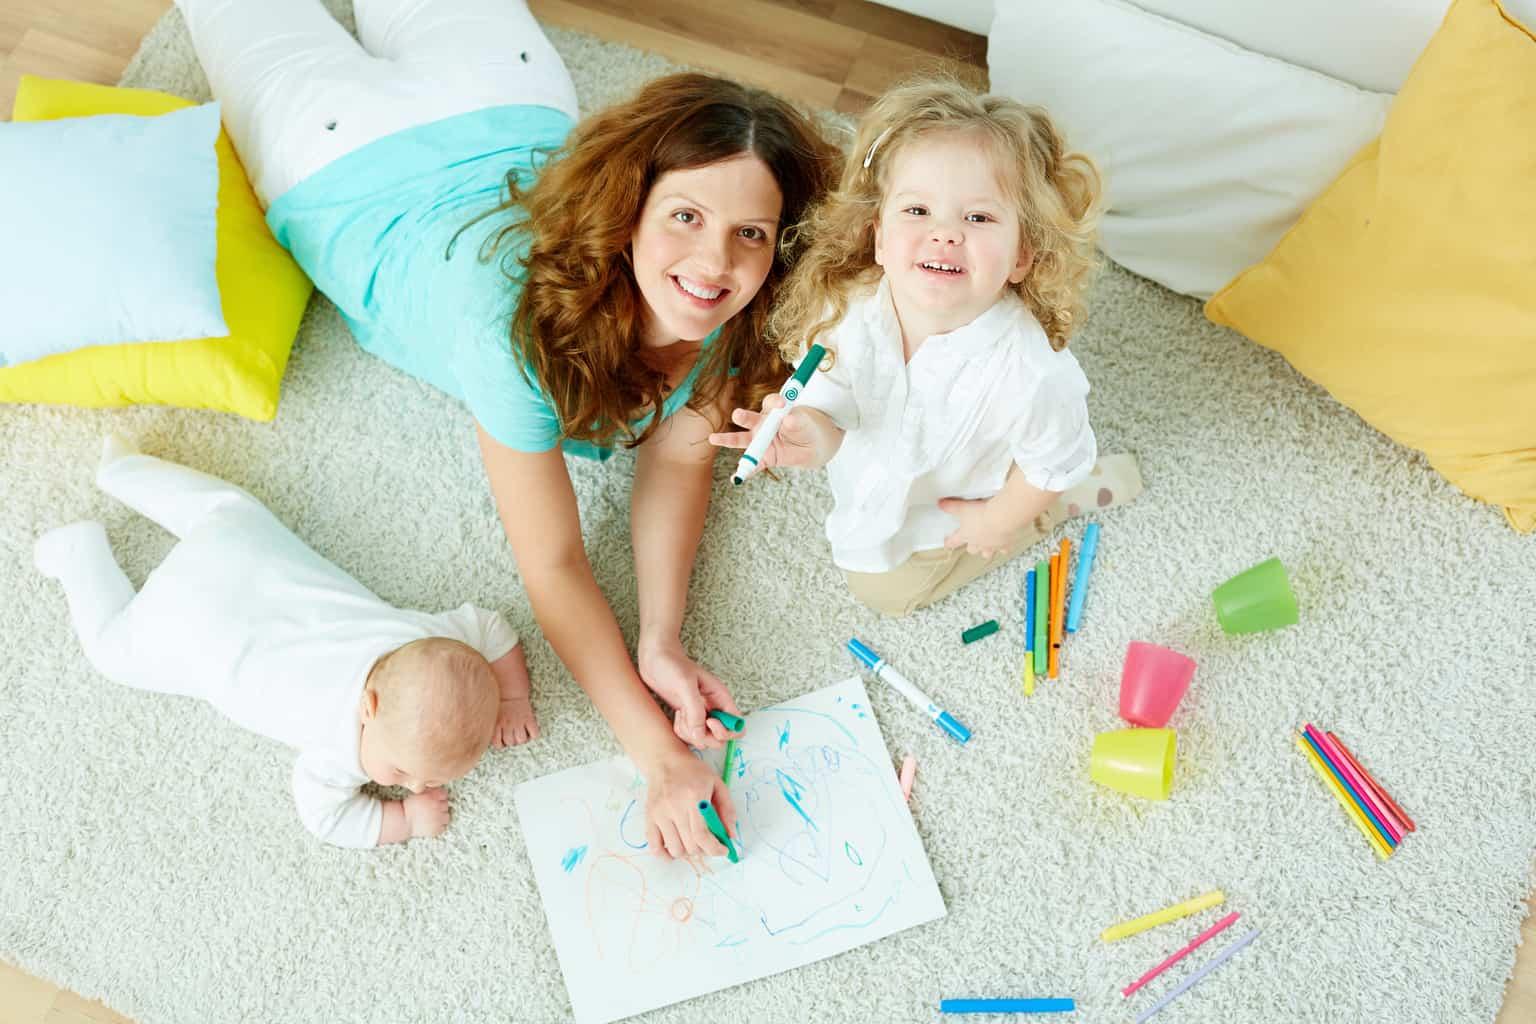 6 tips to encourage creativity in children + #win